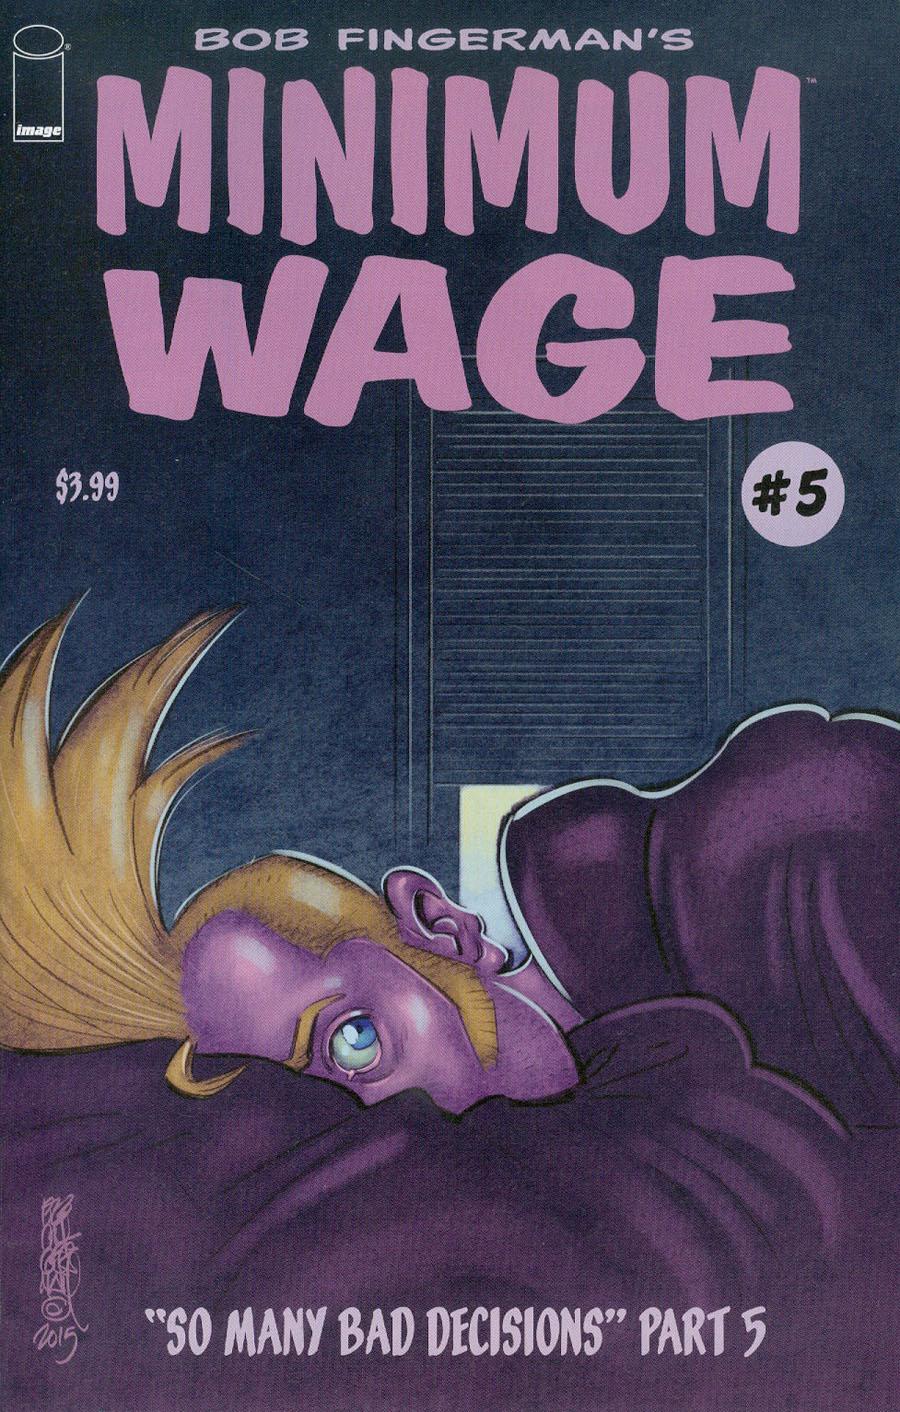 Minimum Wage So Many Bad Decisions #5